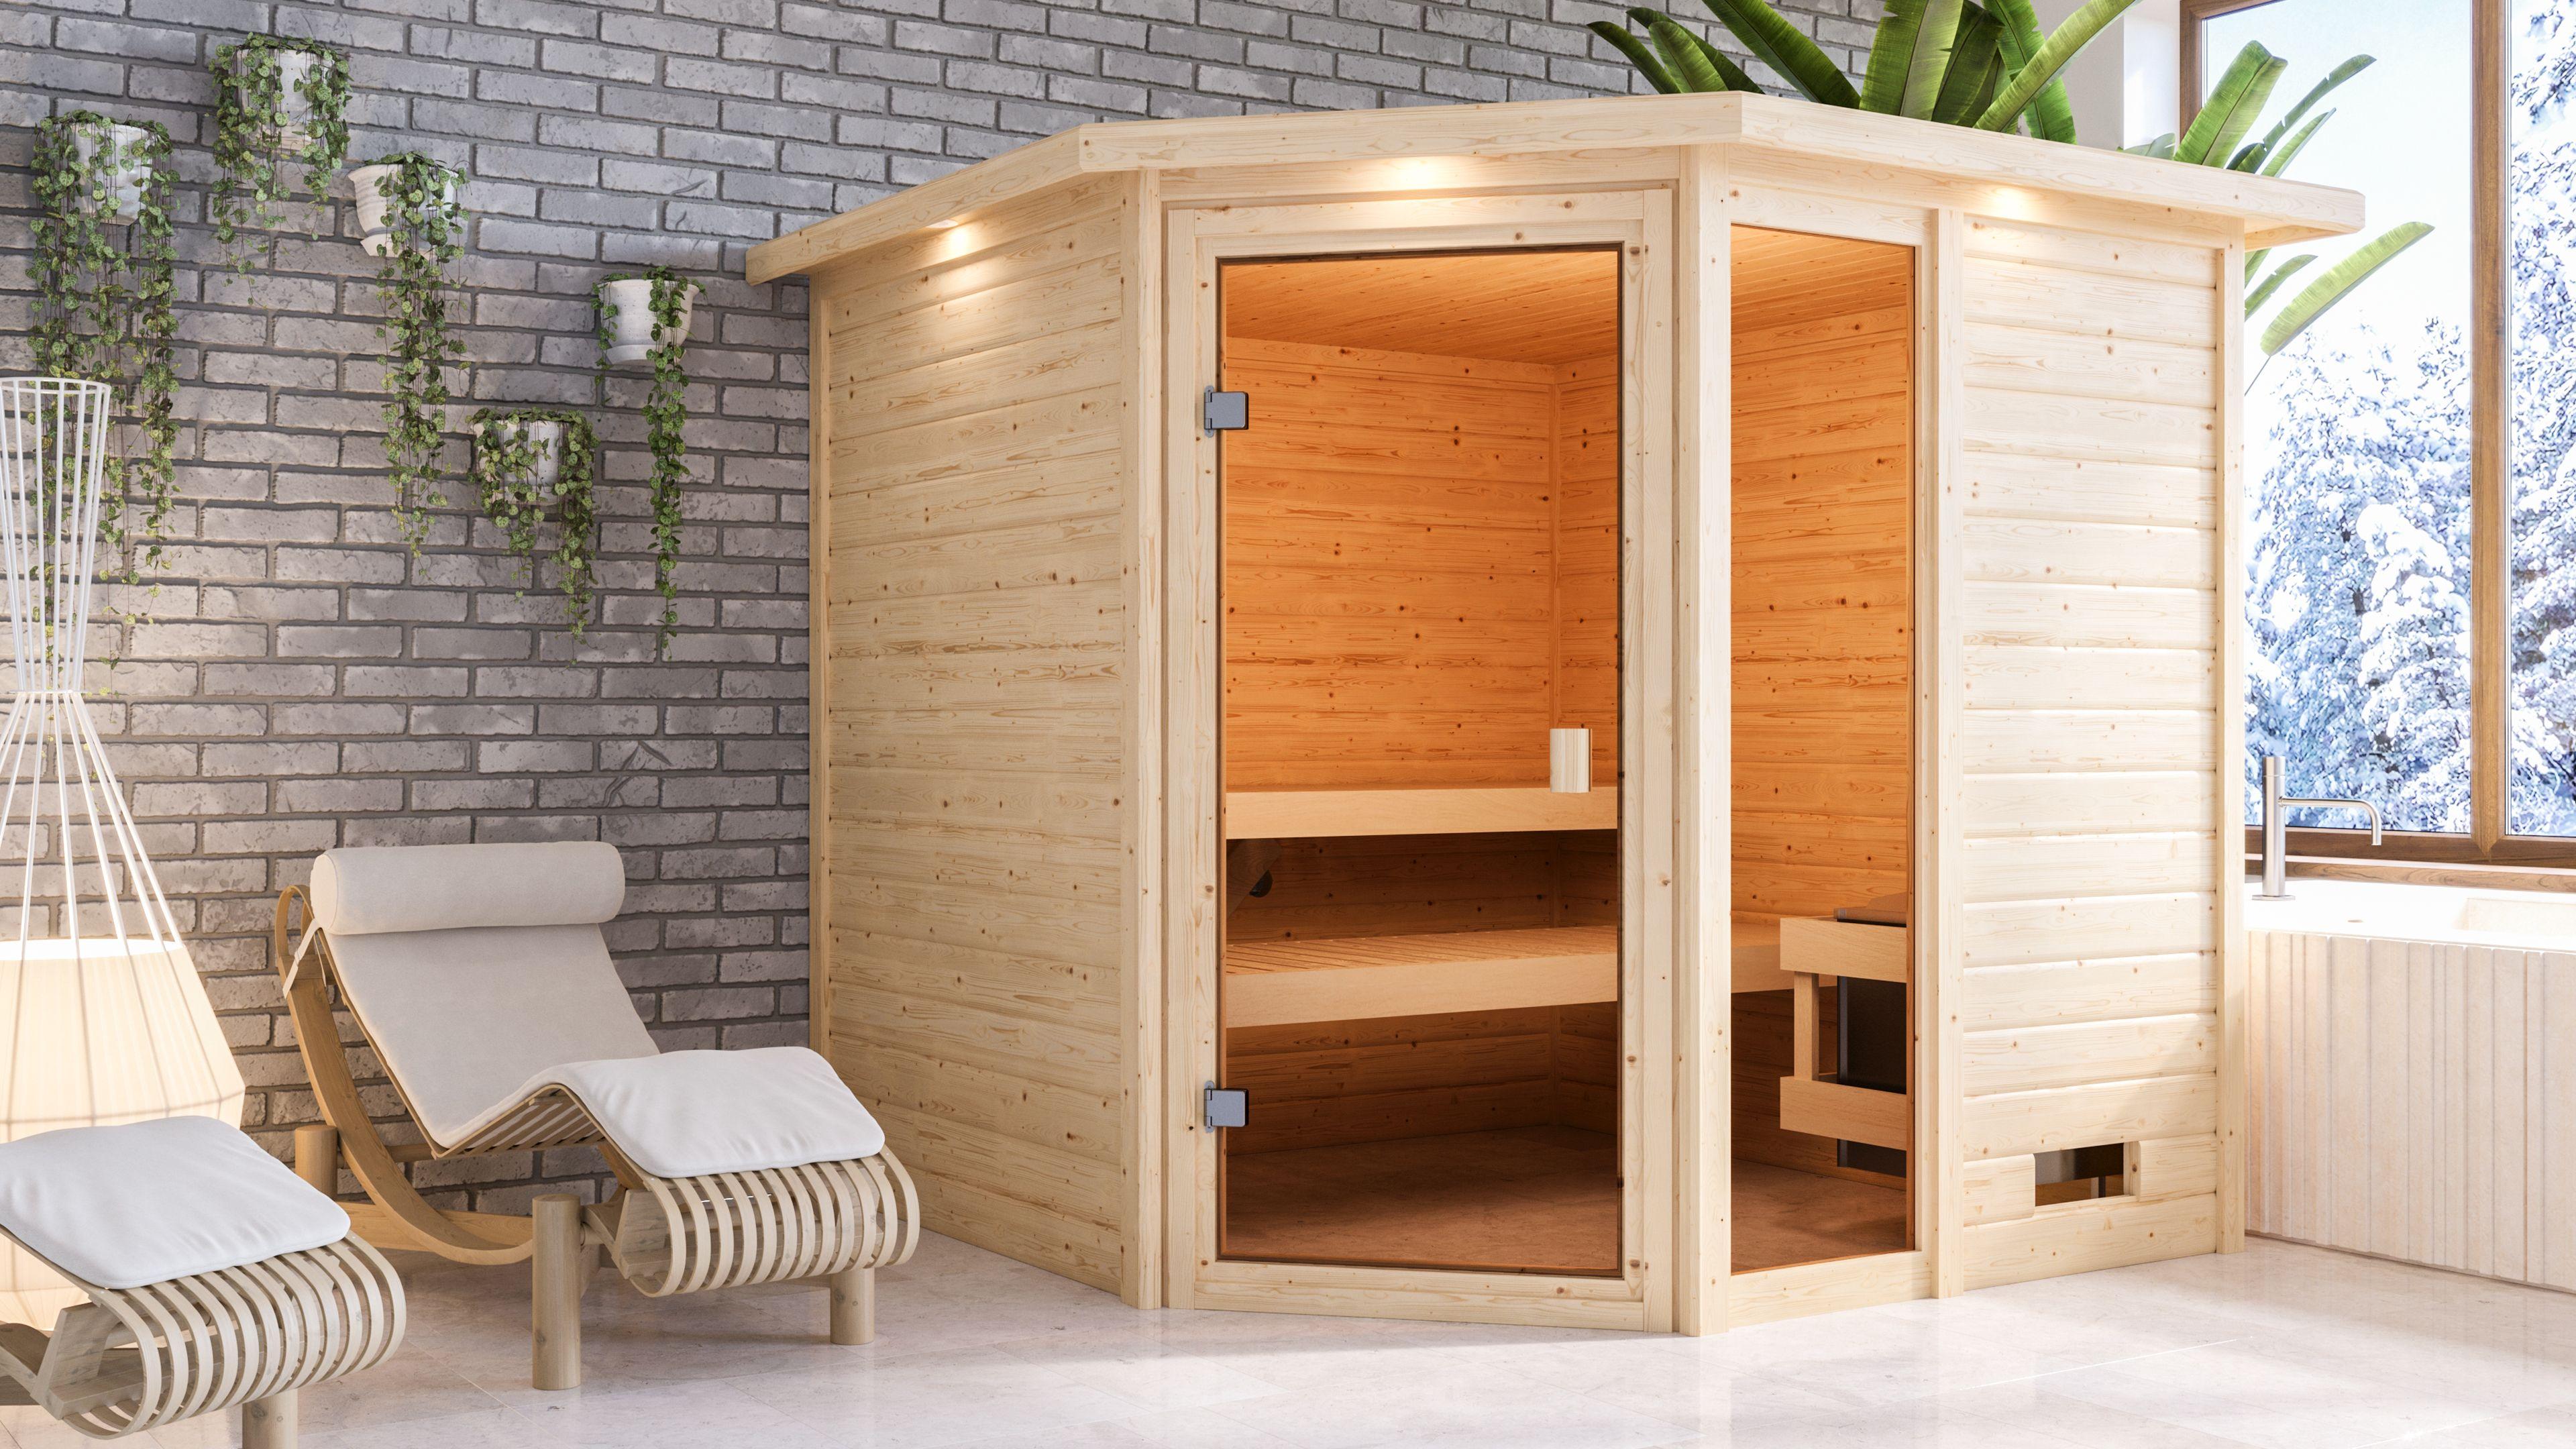 Woodfeeling Sauna Tabea 38mm Dachkranz Saunaofen 9 kW intern Bild 4